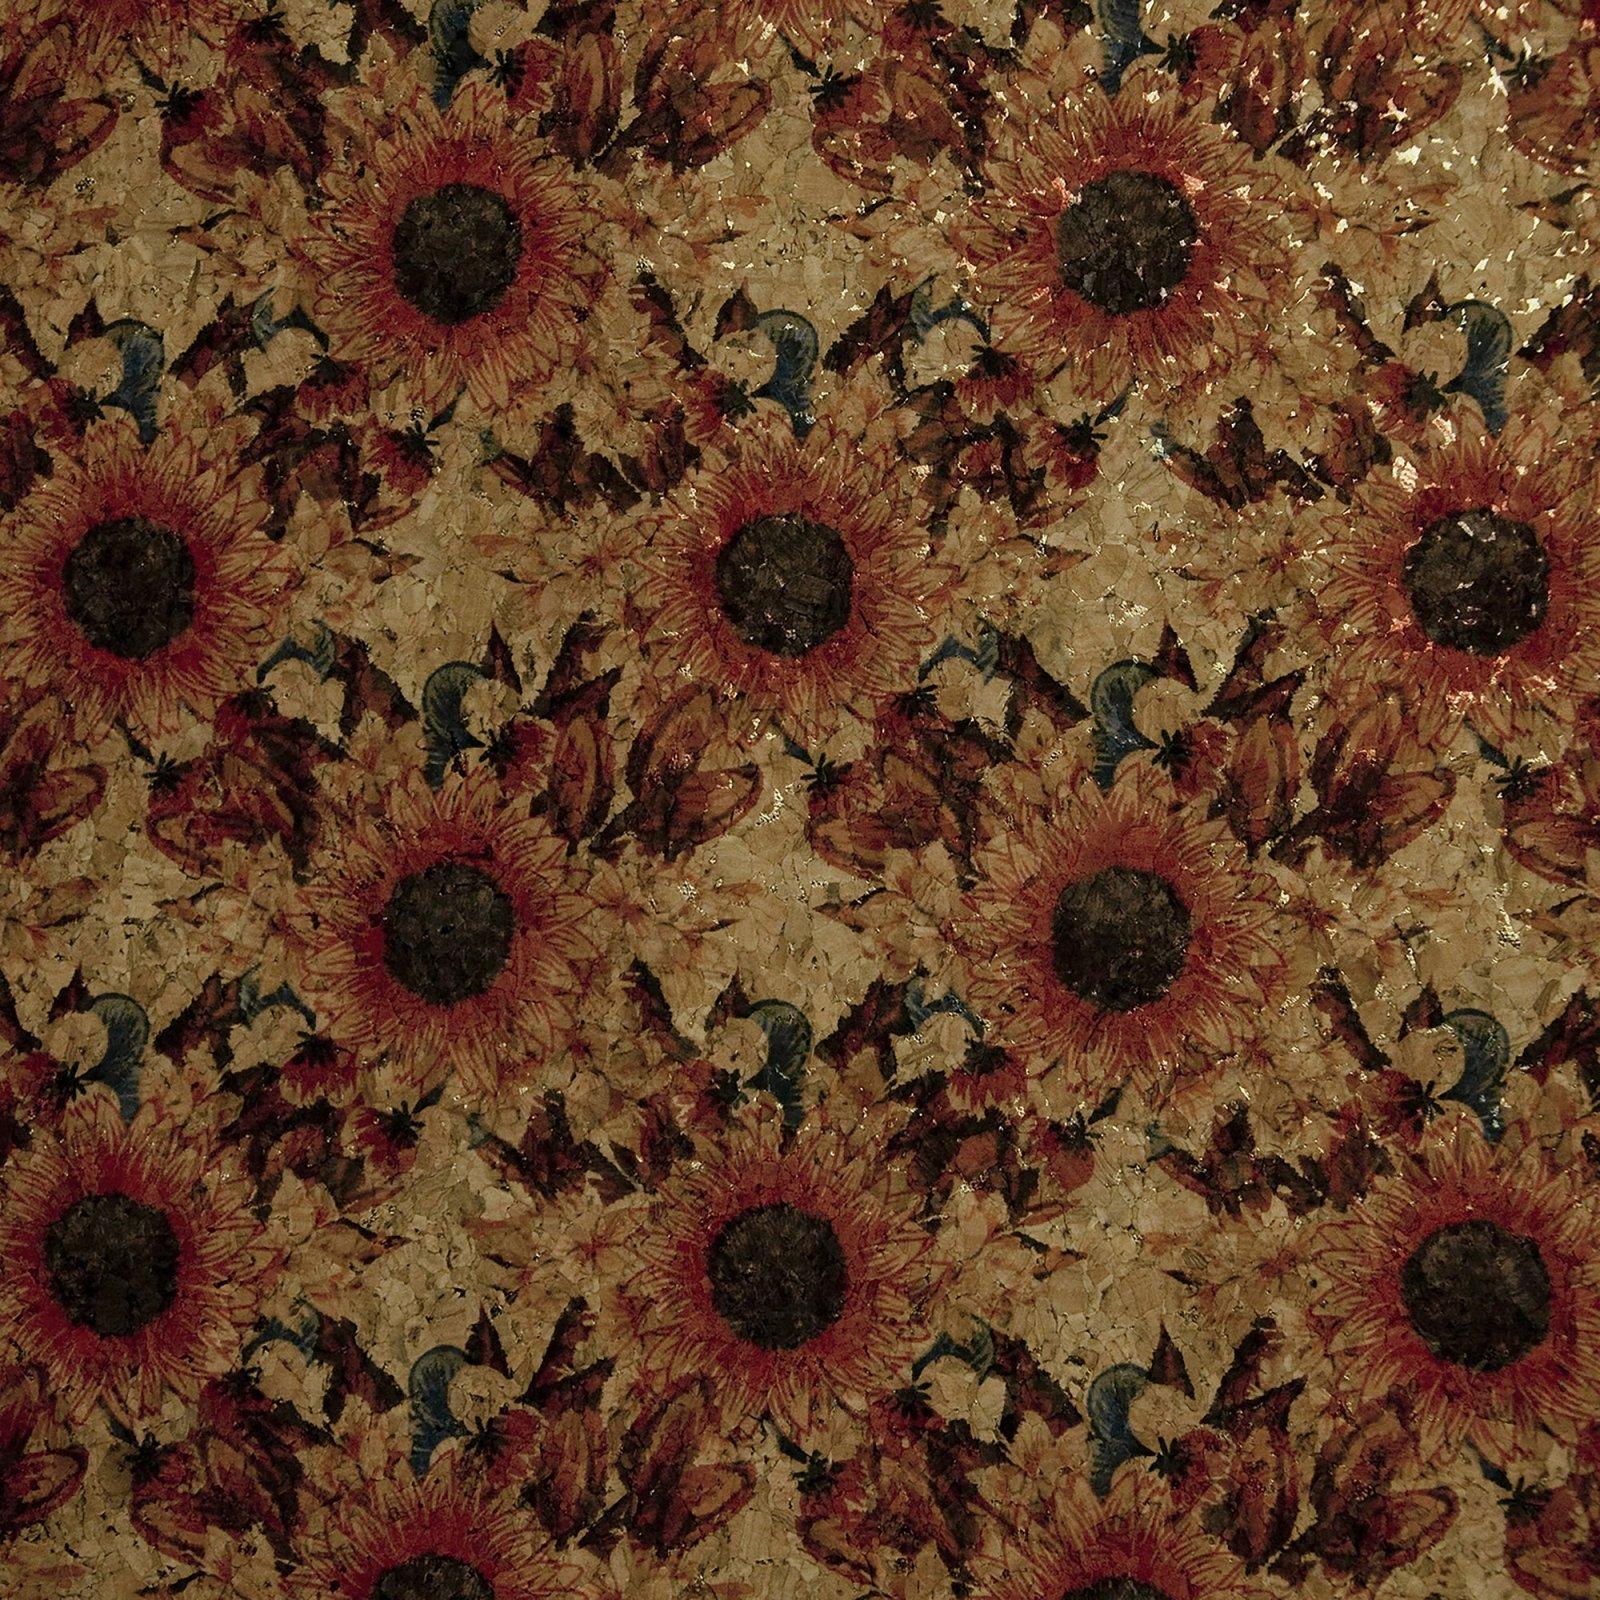 Cork Fabric 18x15 Red Sunflower